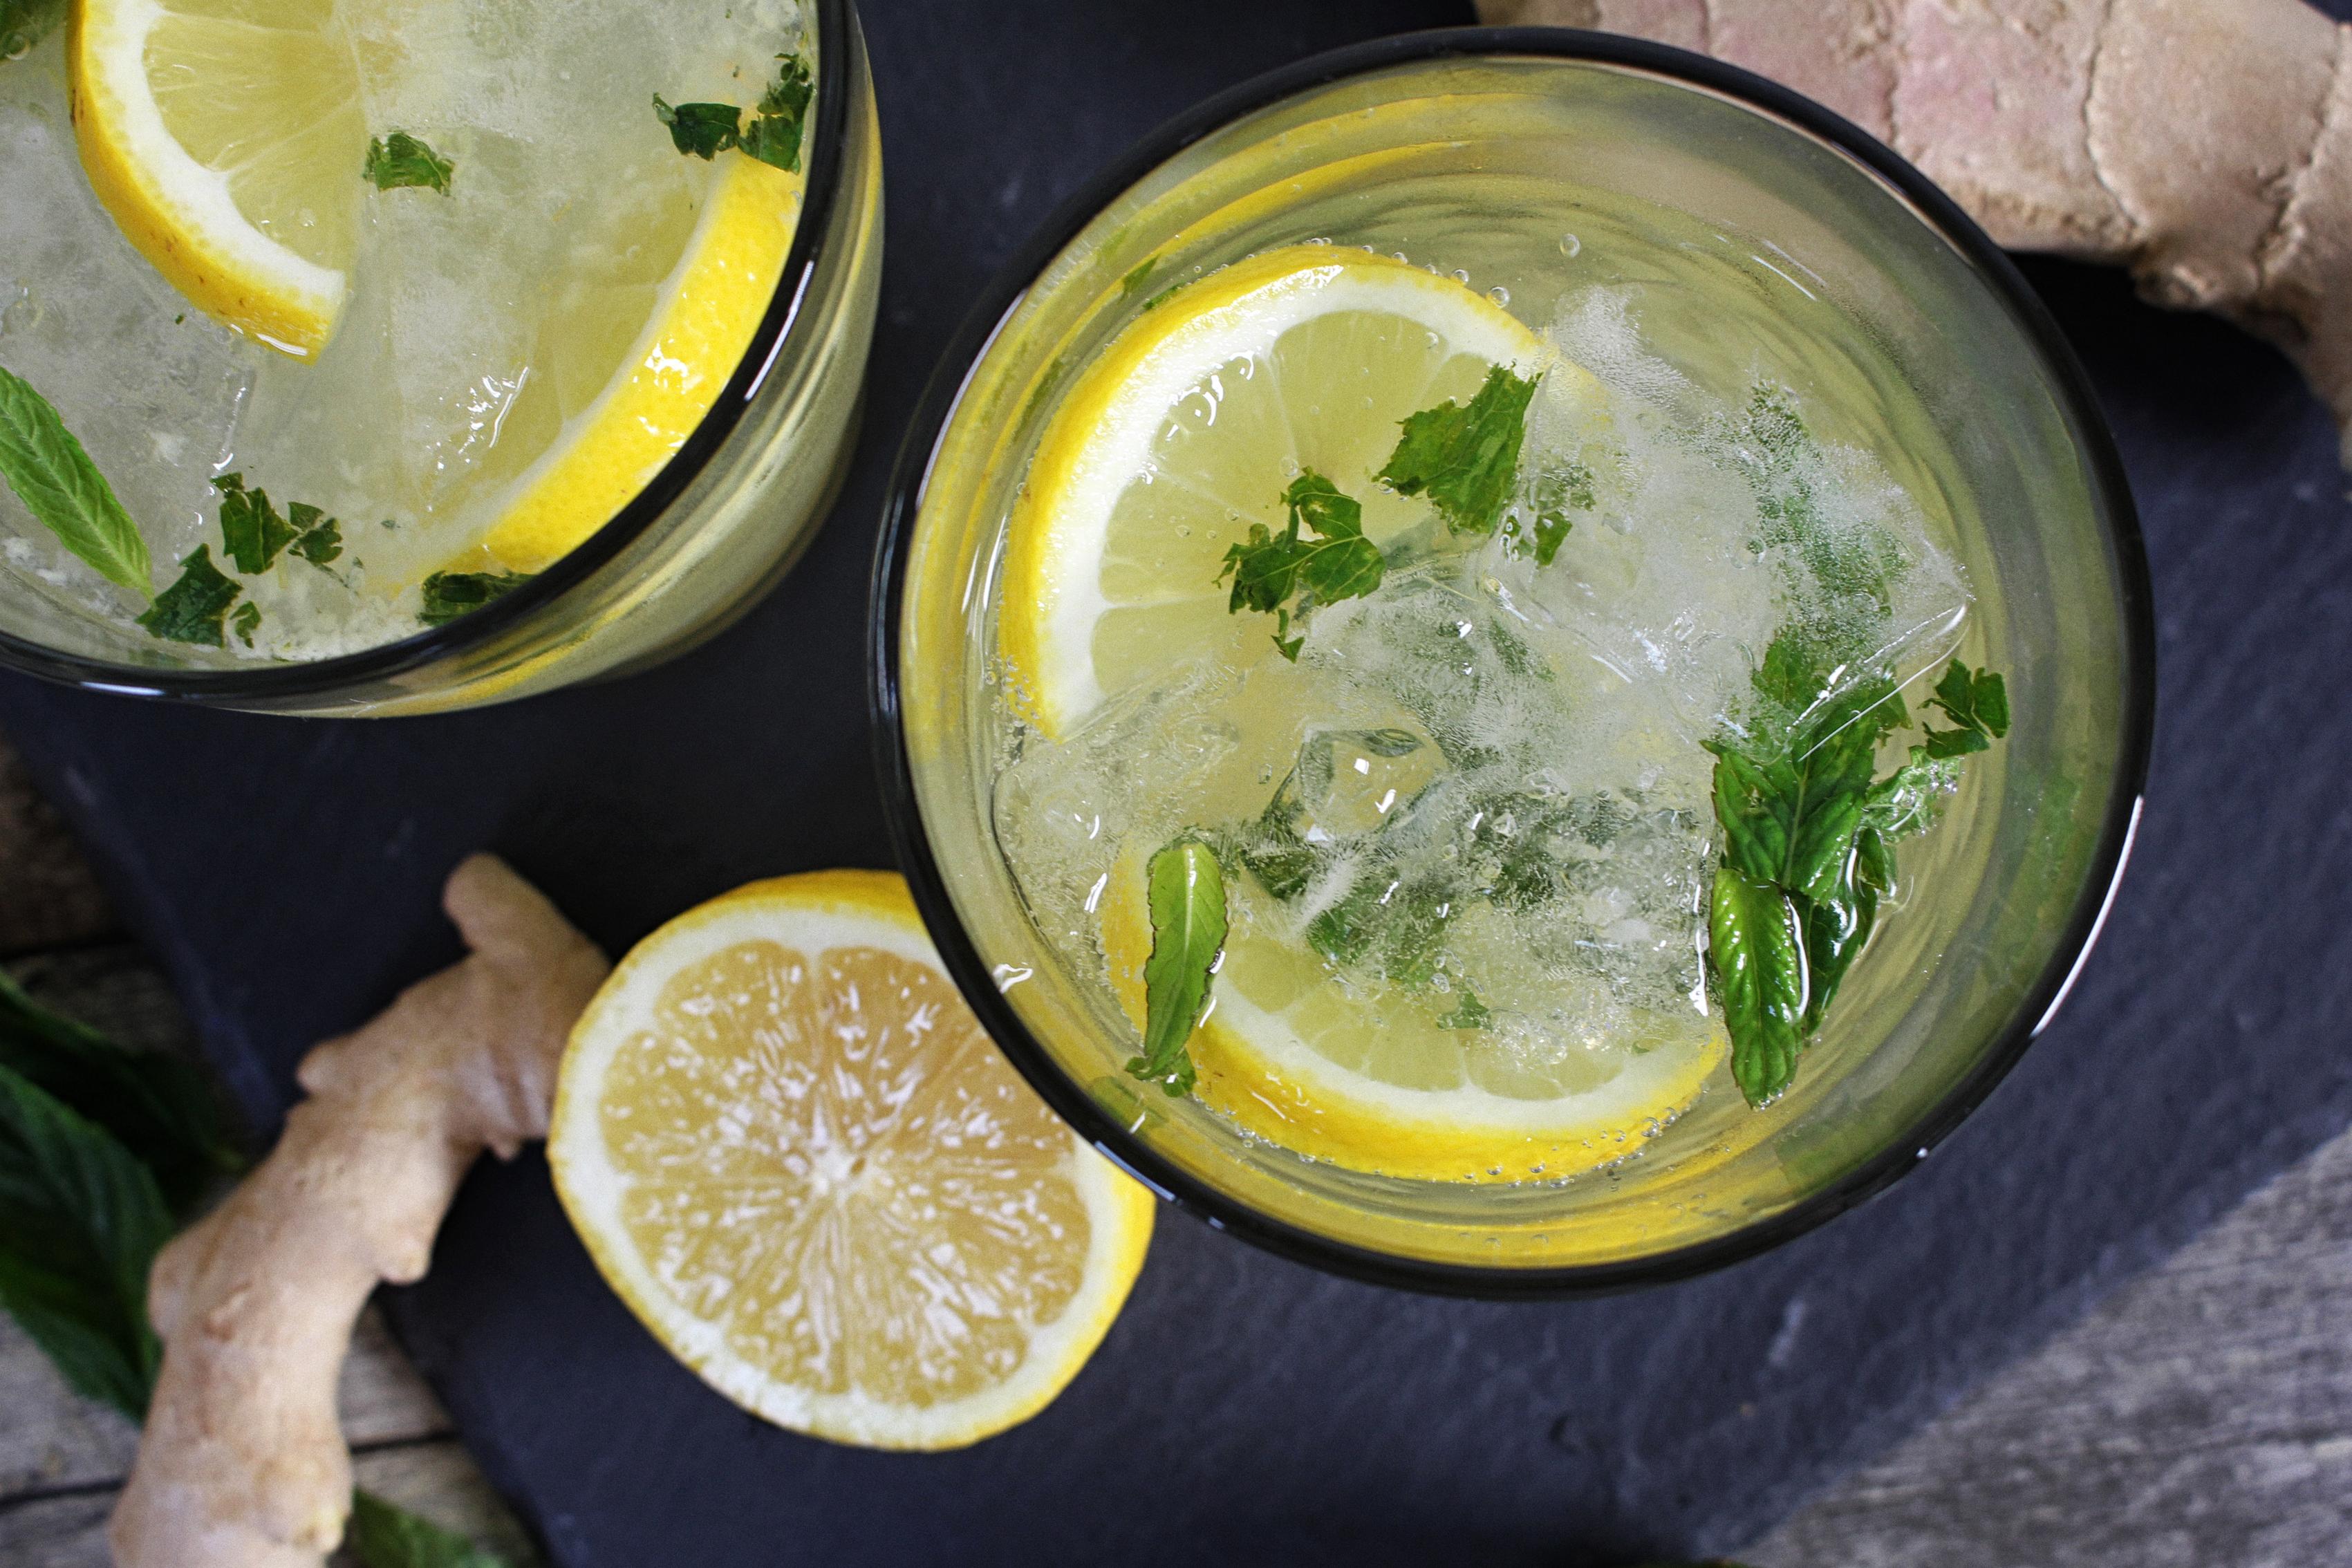 ingwer-limonade-ohne-zucker-rezept-alkoholfrei